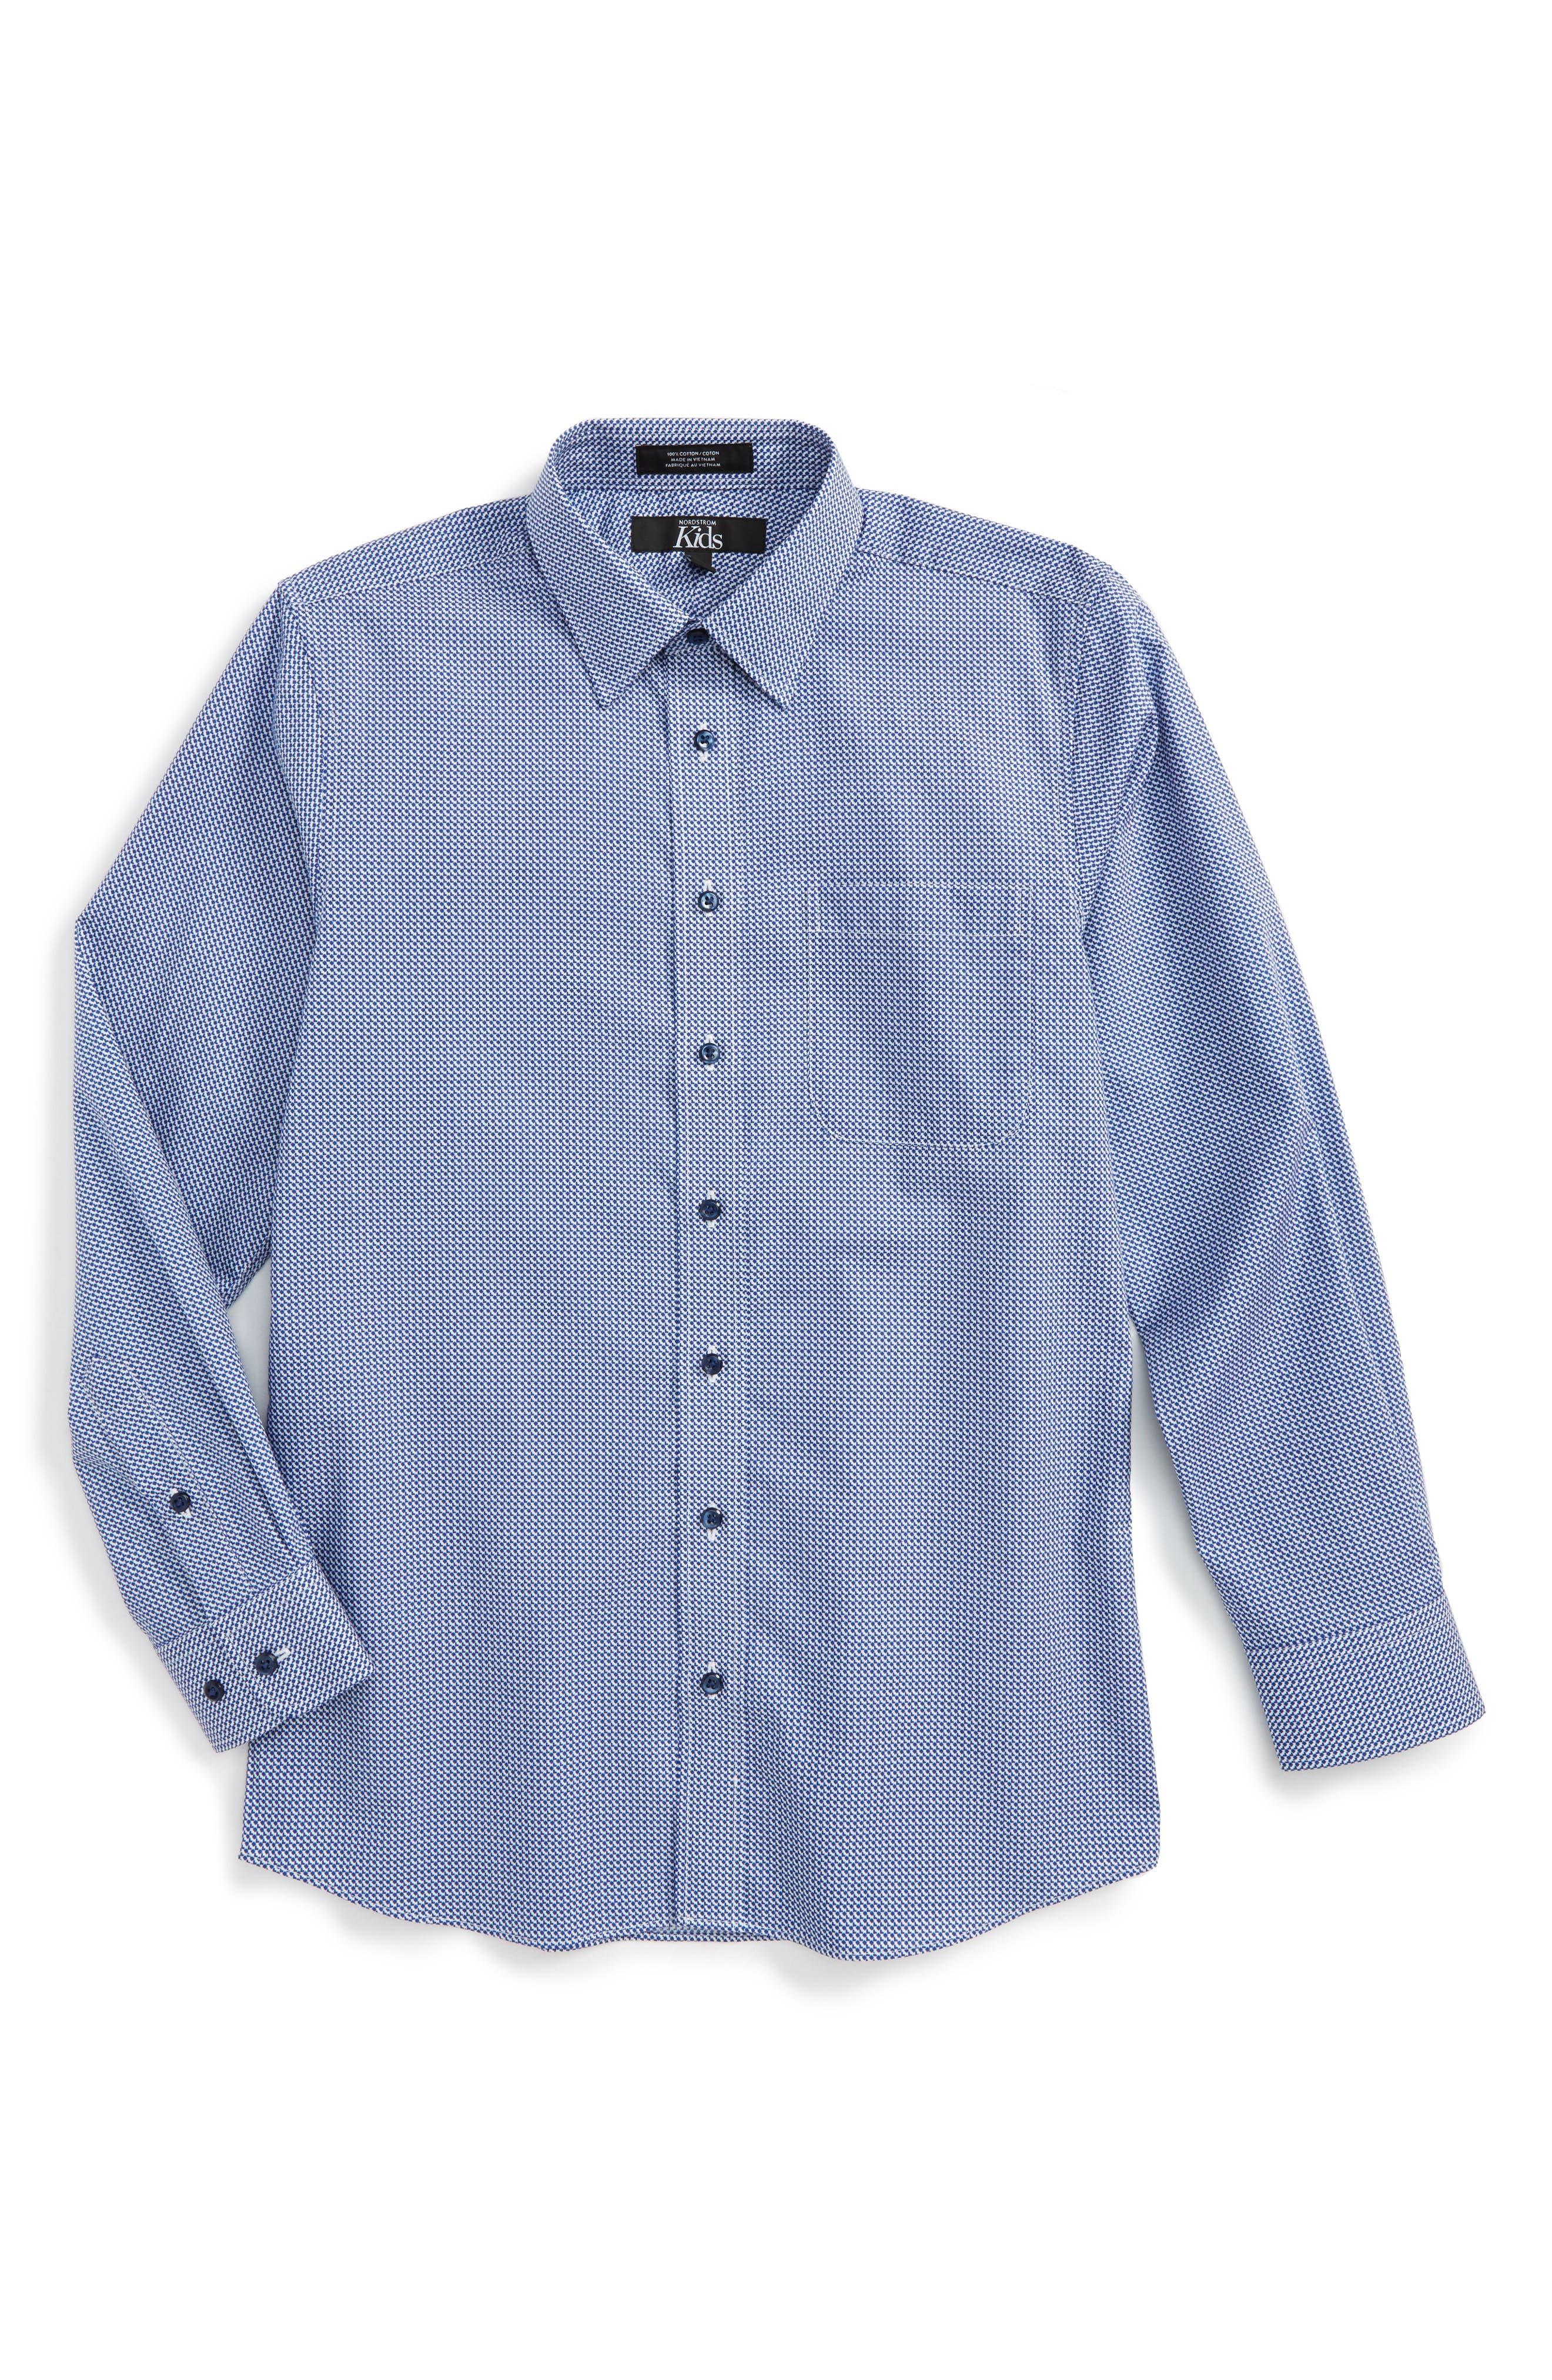 Neat Dress Shirt,                         Main,                         color, Blue Sodalite Neat